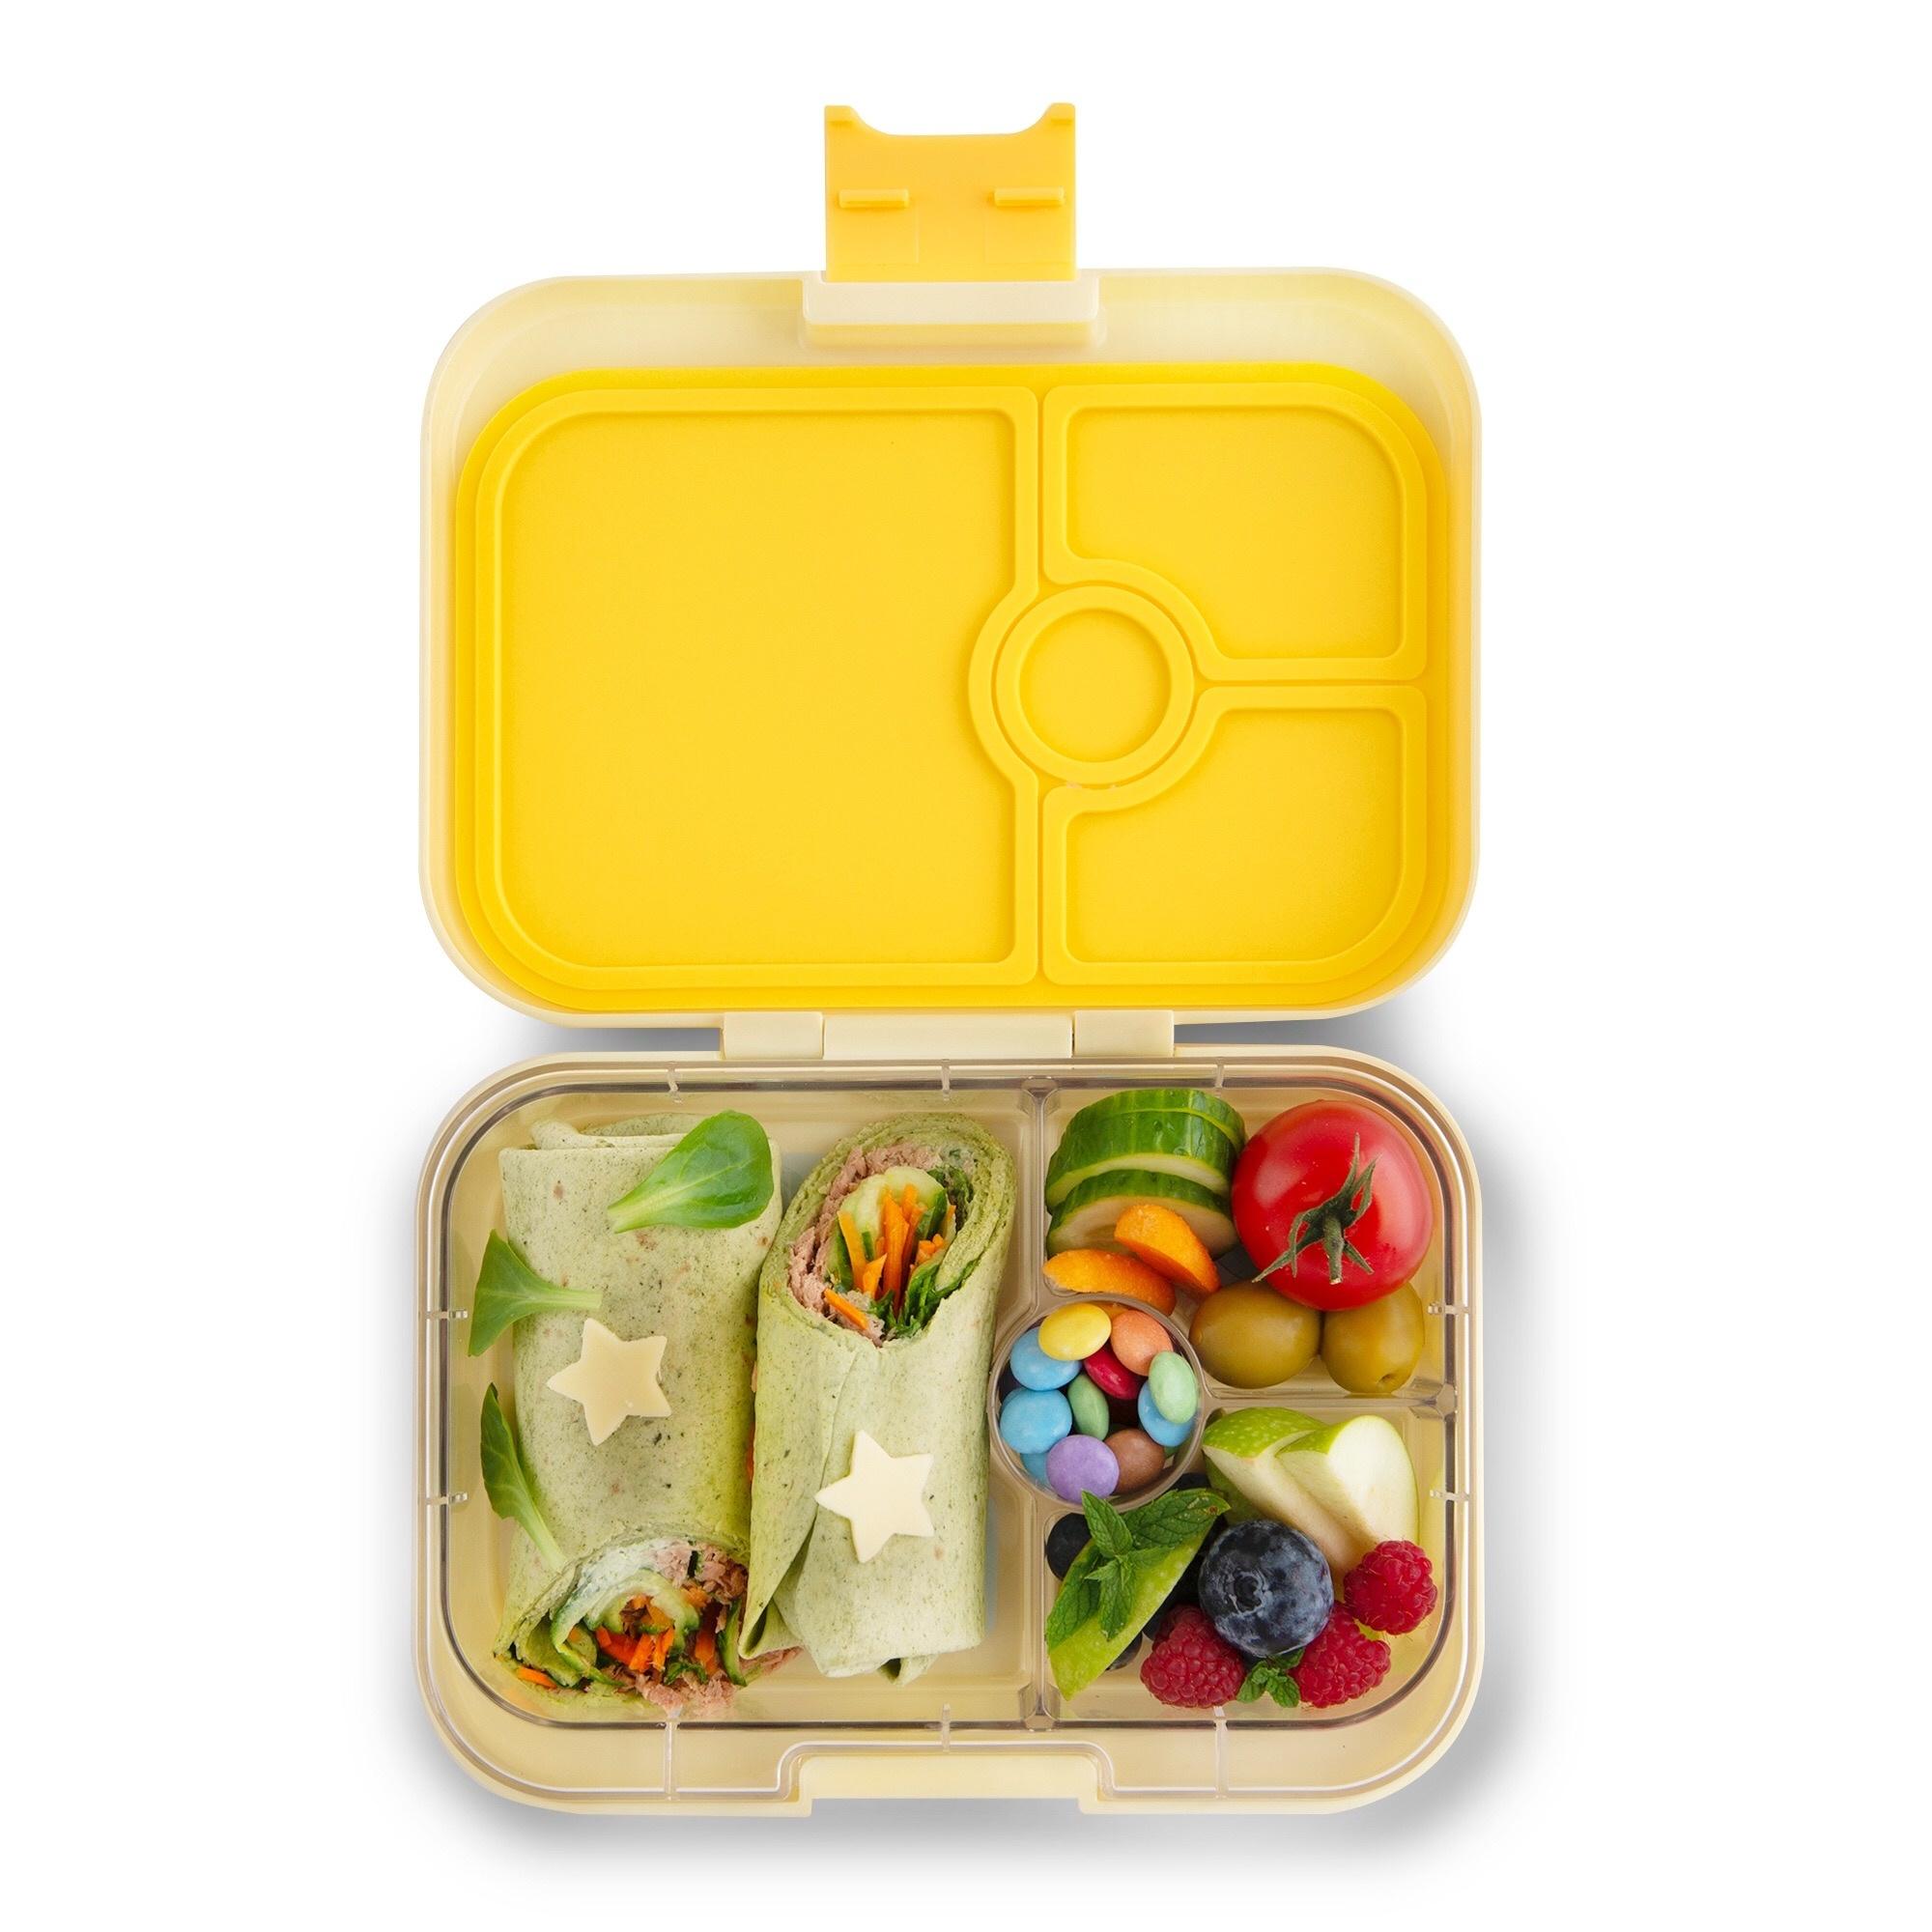 Yumbox Panino 4-sections Sunburst yellow / Paradise tray-2